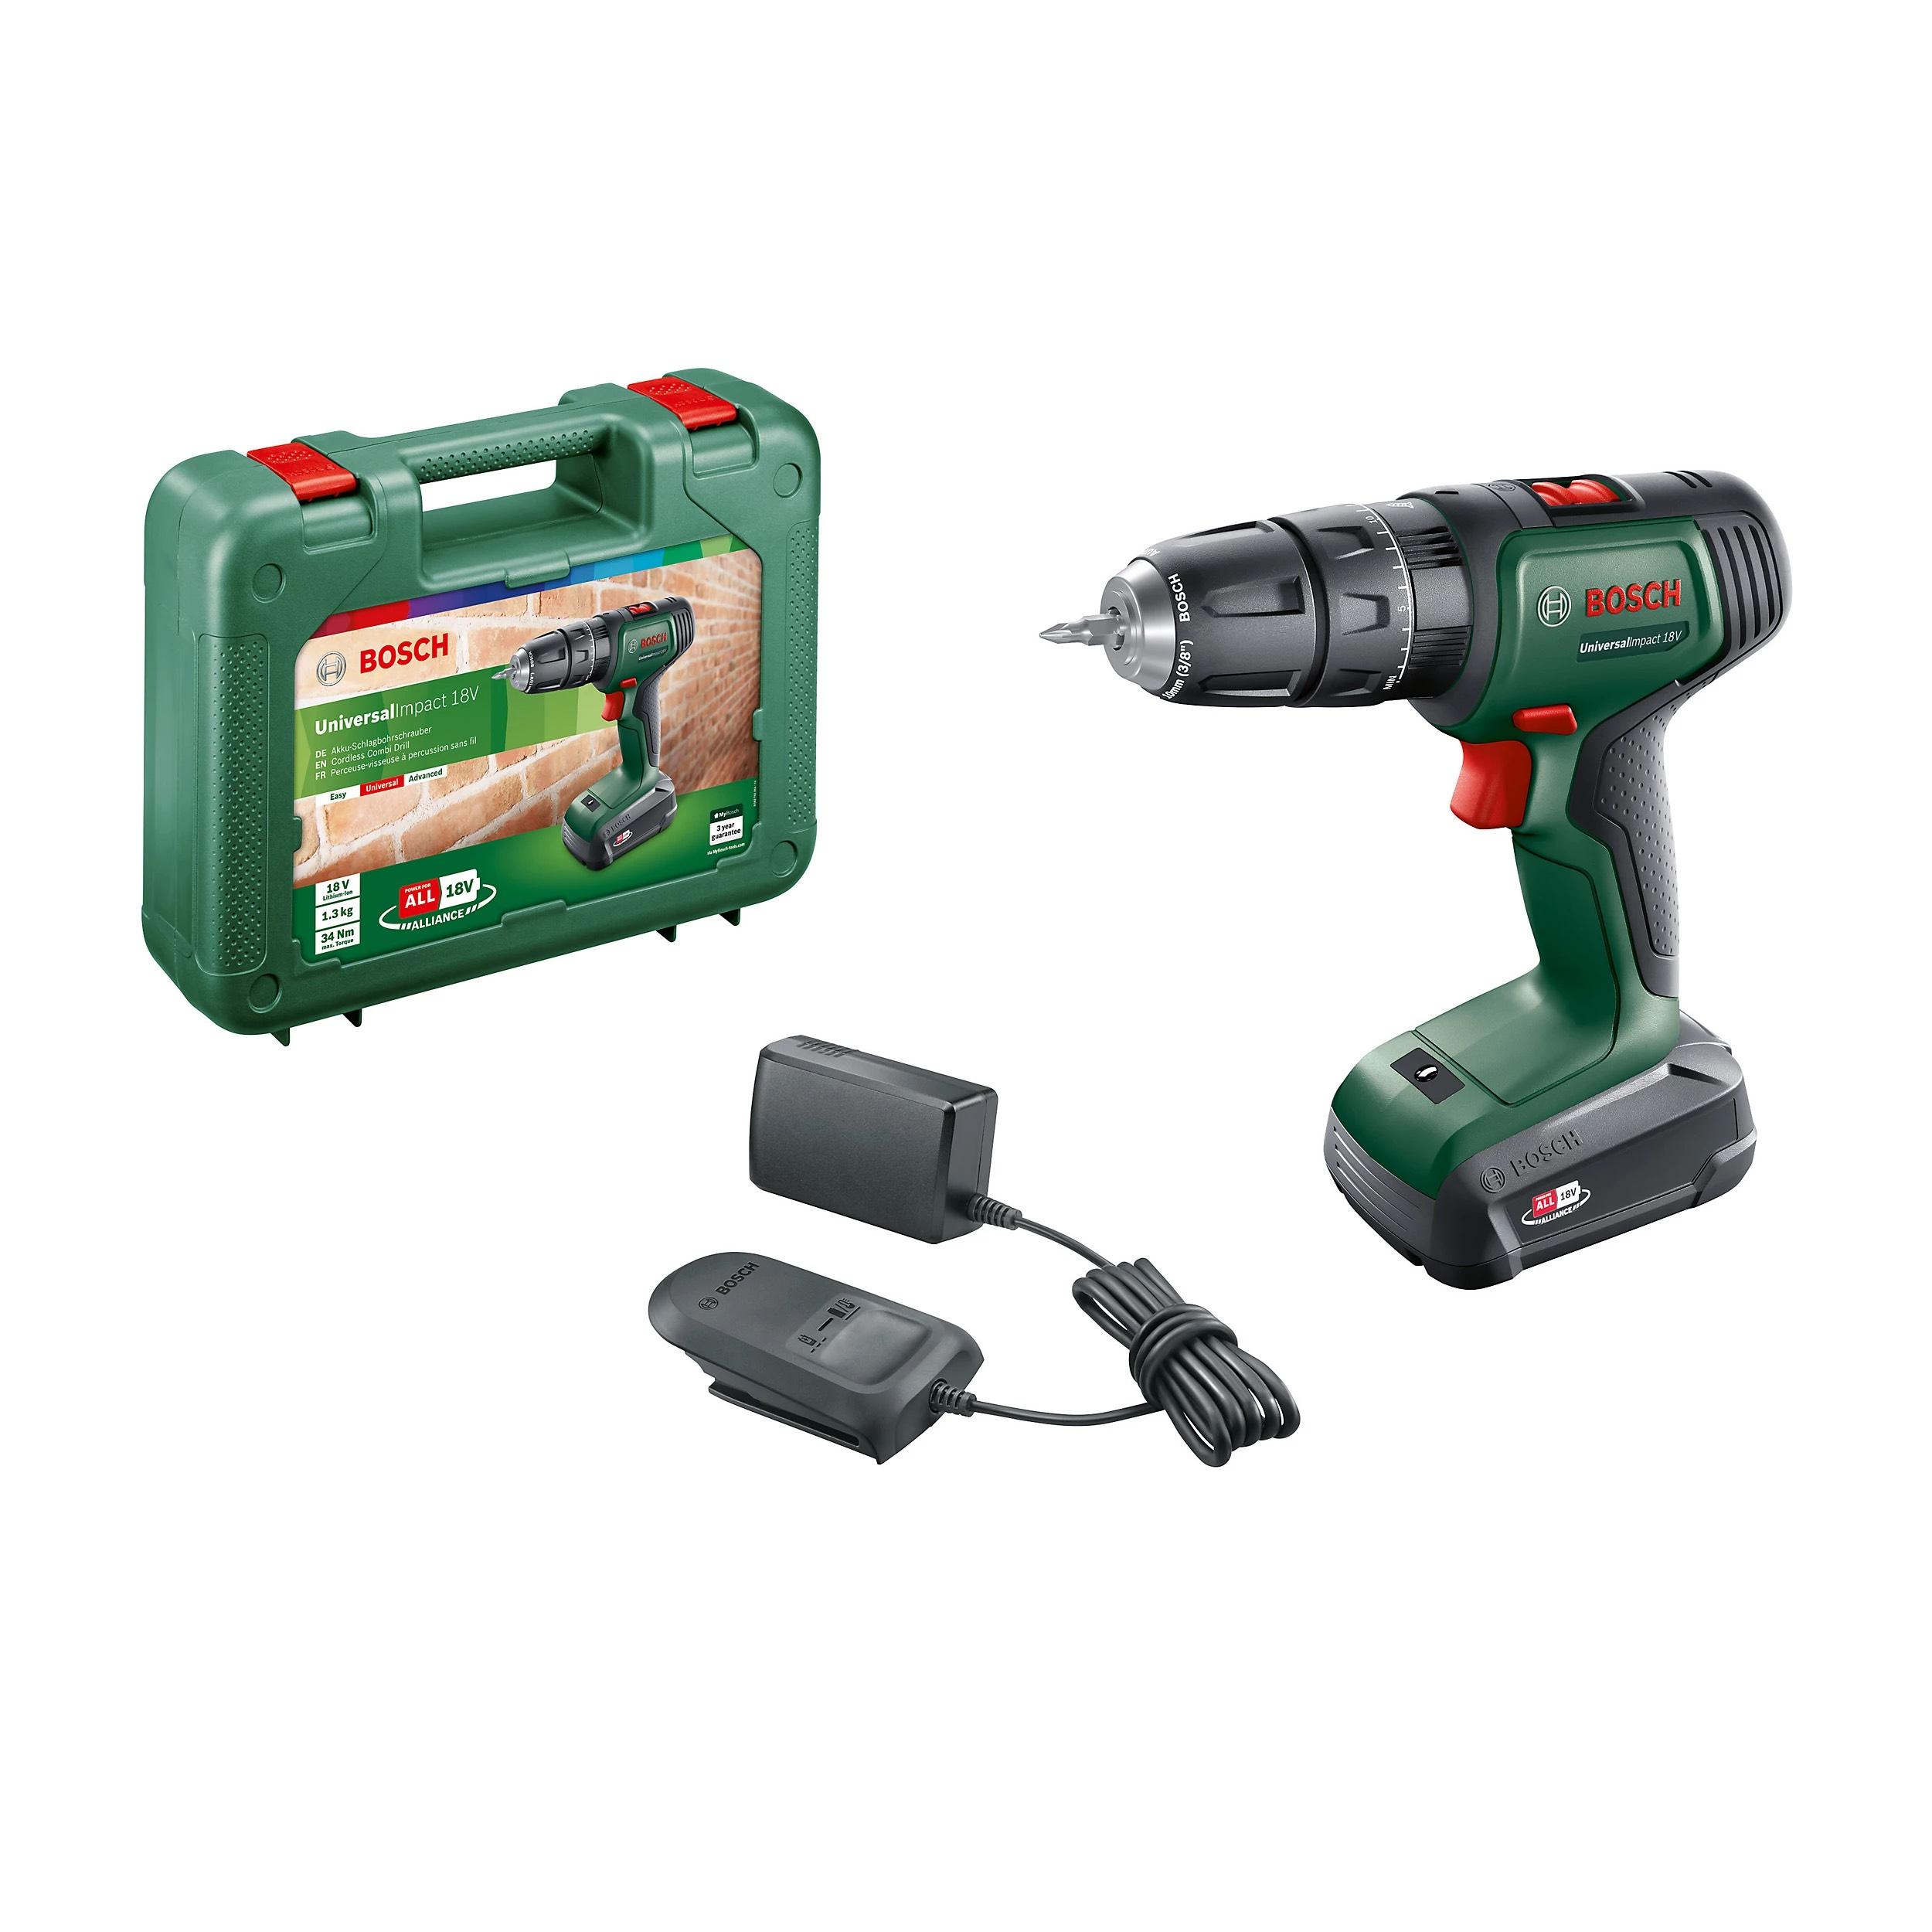 Bosch Power for ALL 18V 1.5Ah Li-ion Cordless Combi drill 0.603.9D4.170 £70 @ B&Q